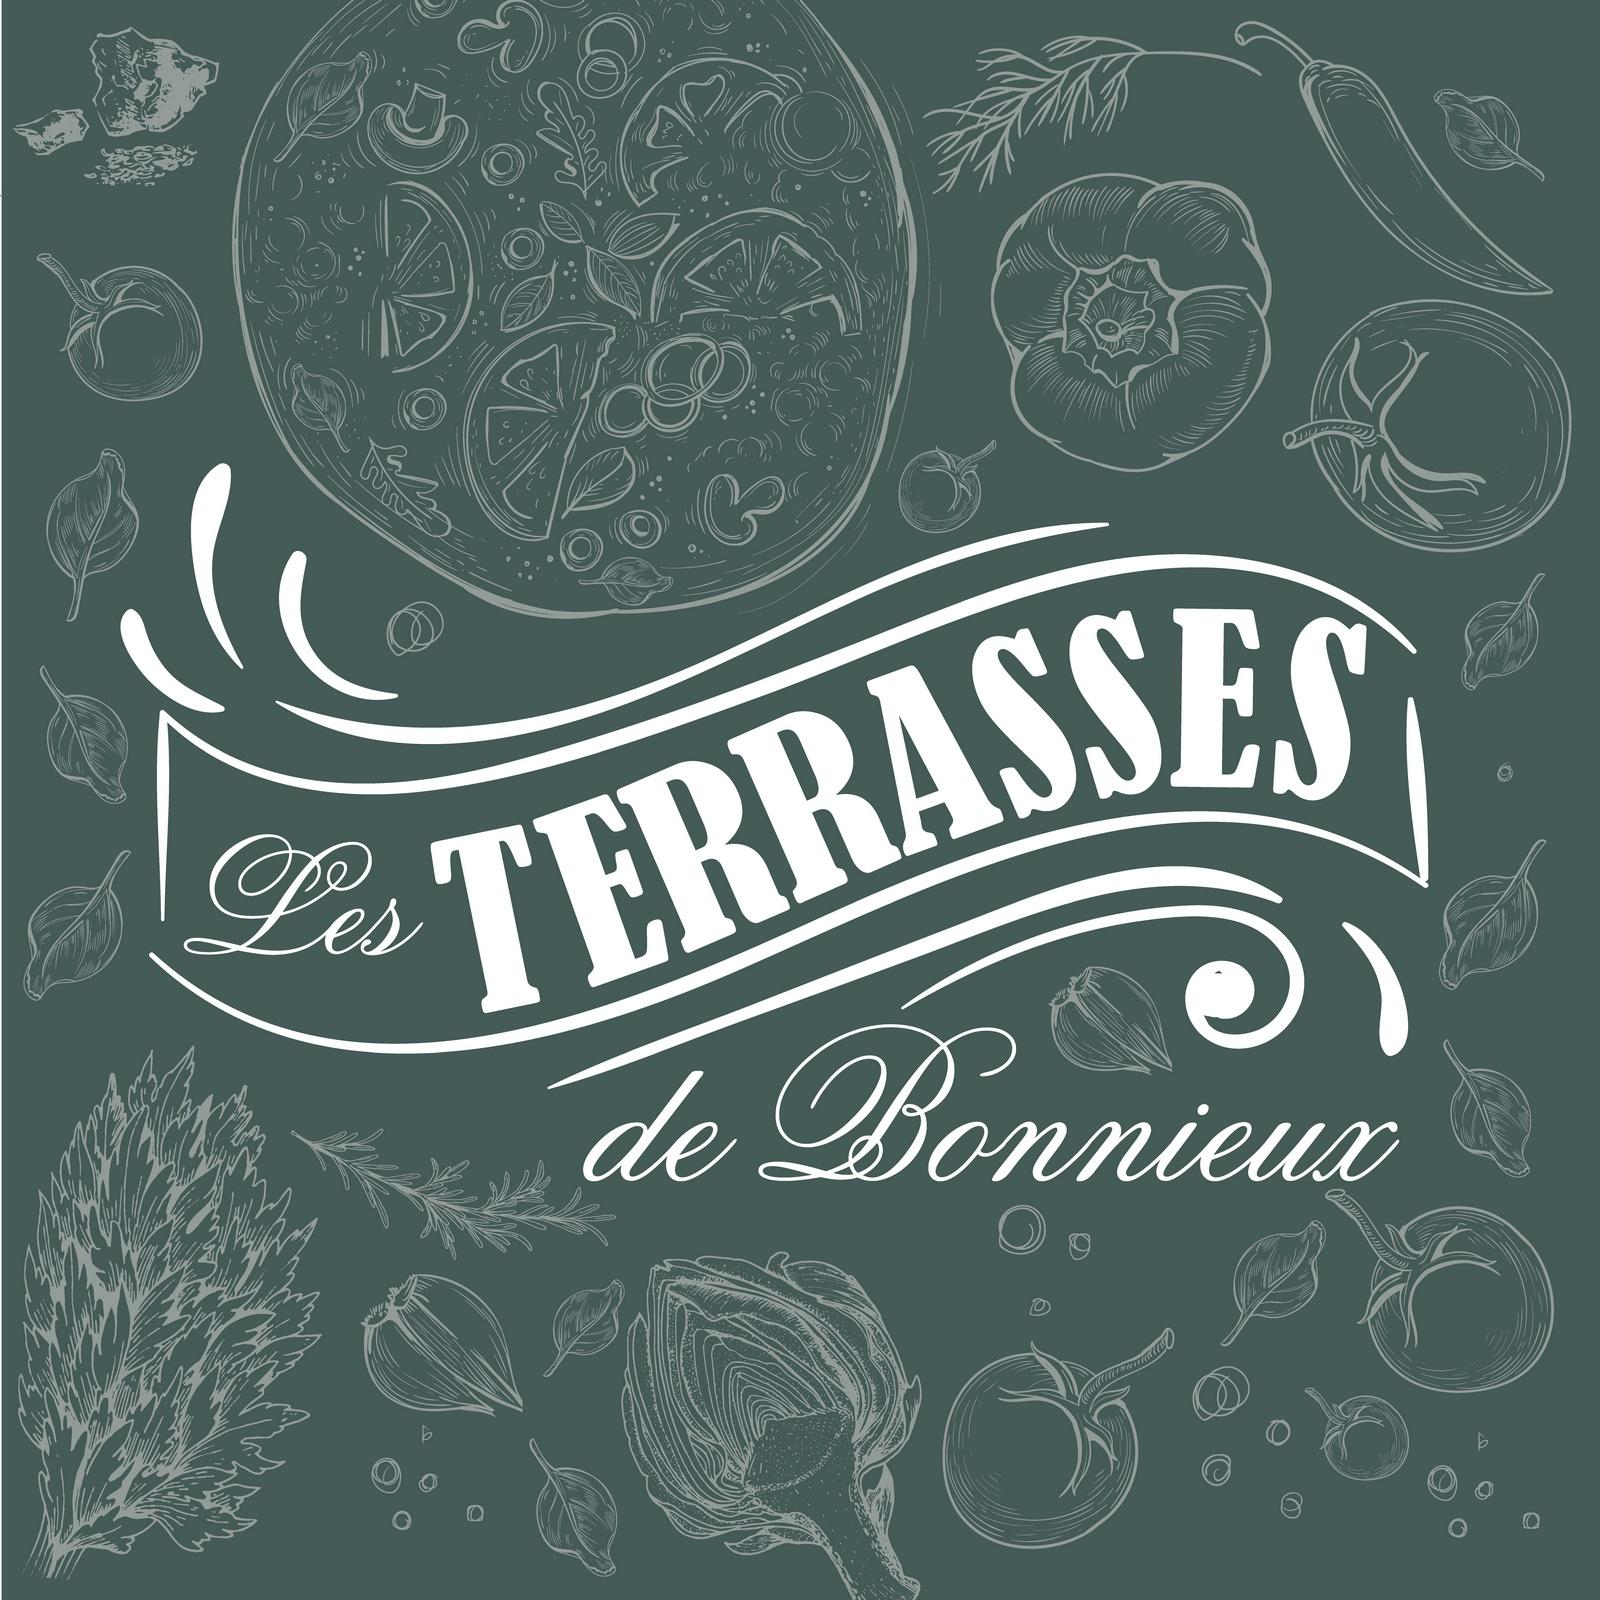 Logo Les Terrasses de Bonnieux